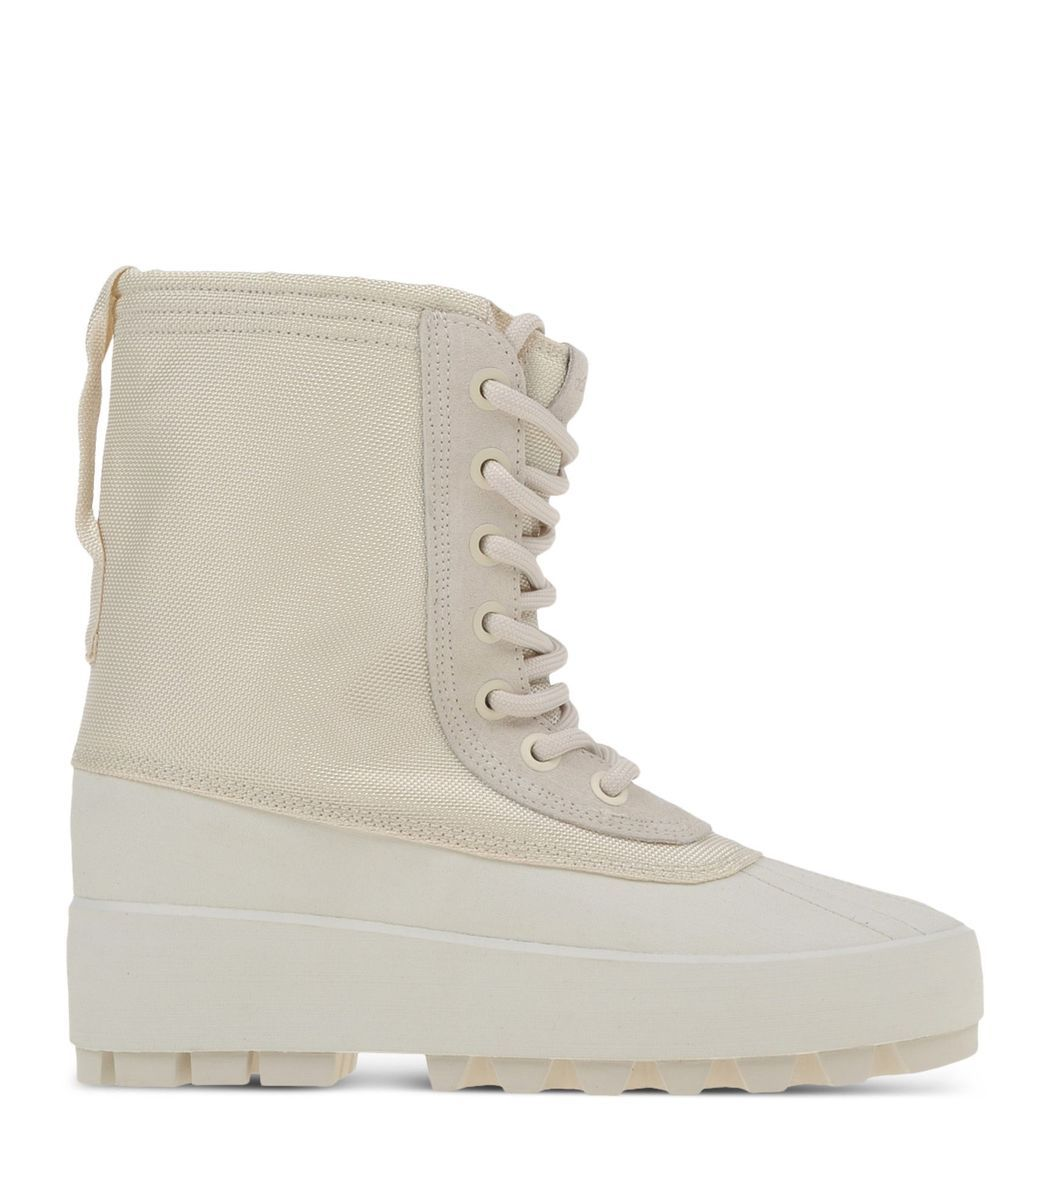 4a69e5ac560 Adidas X Kanye West YEEZY 950 Boot